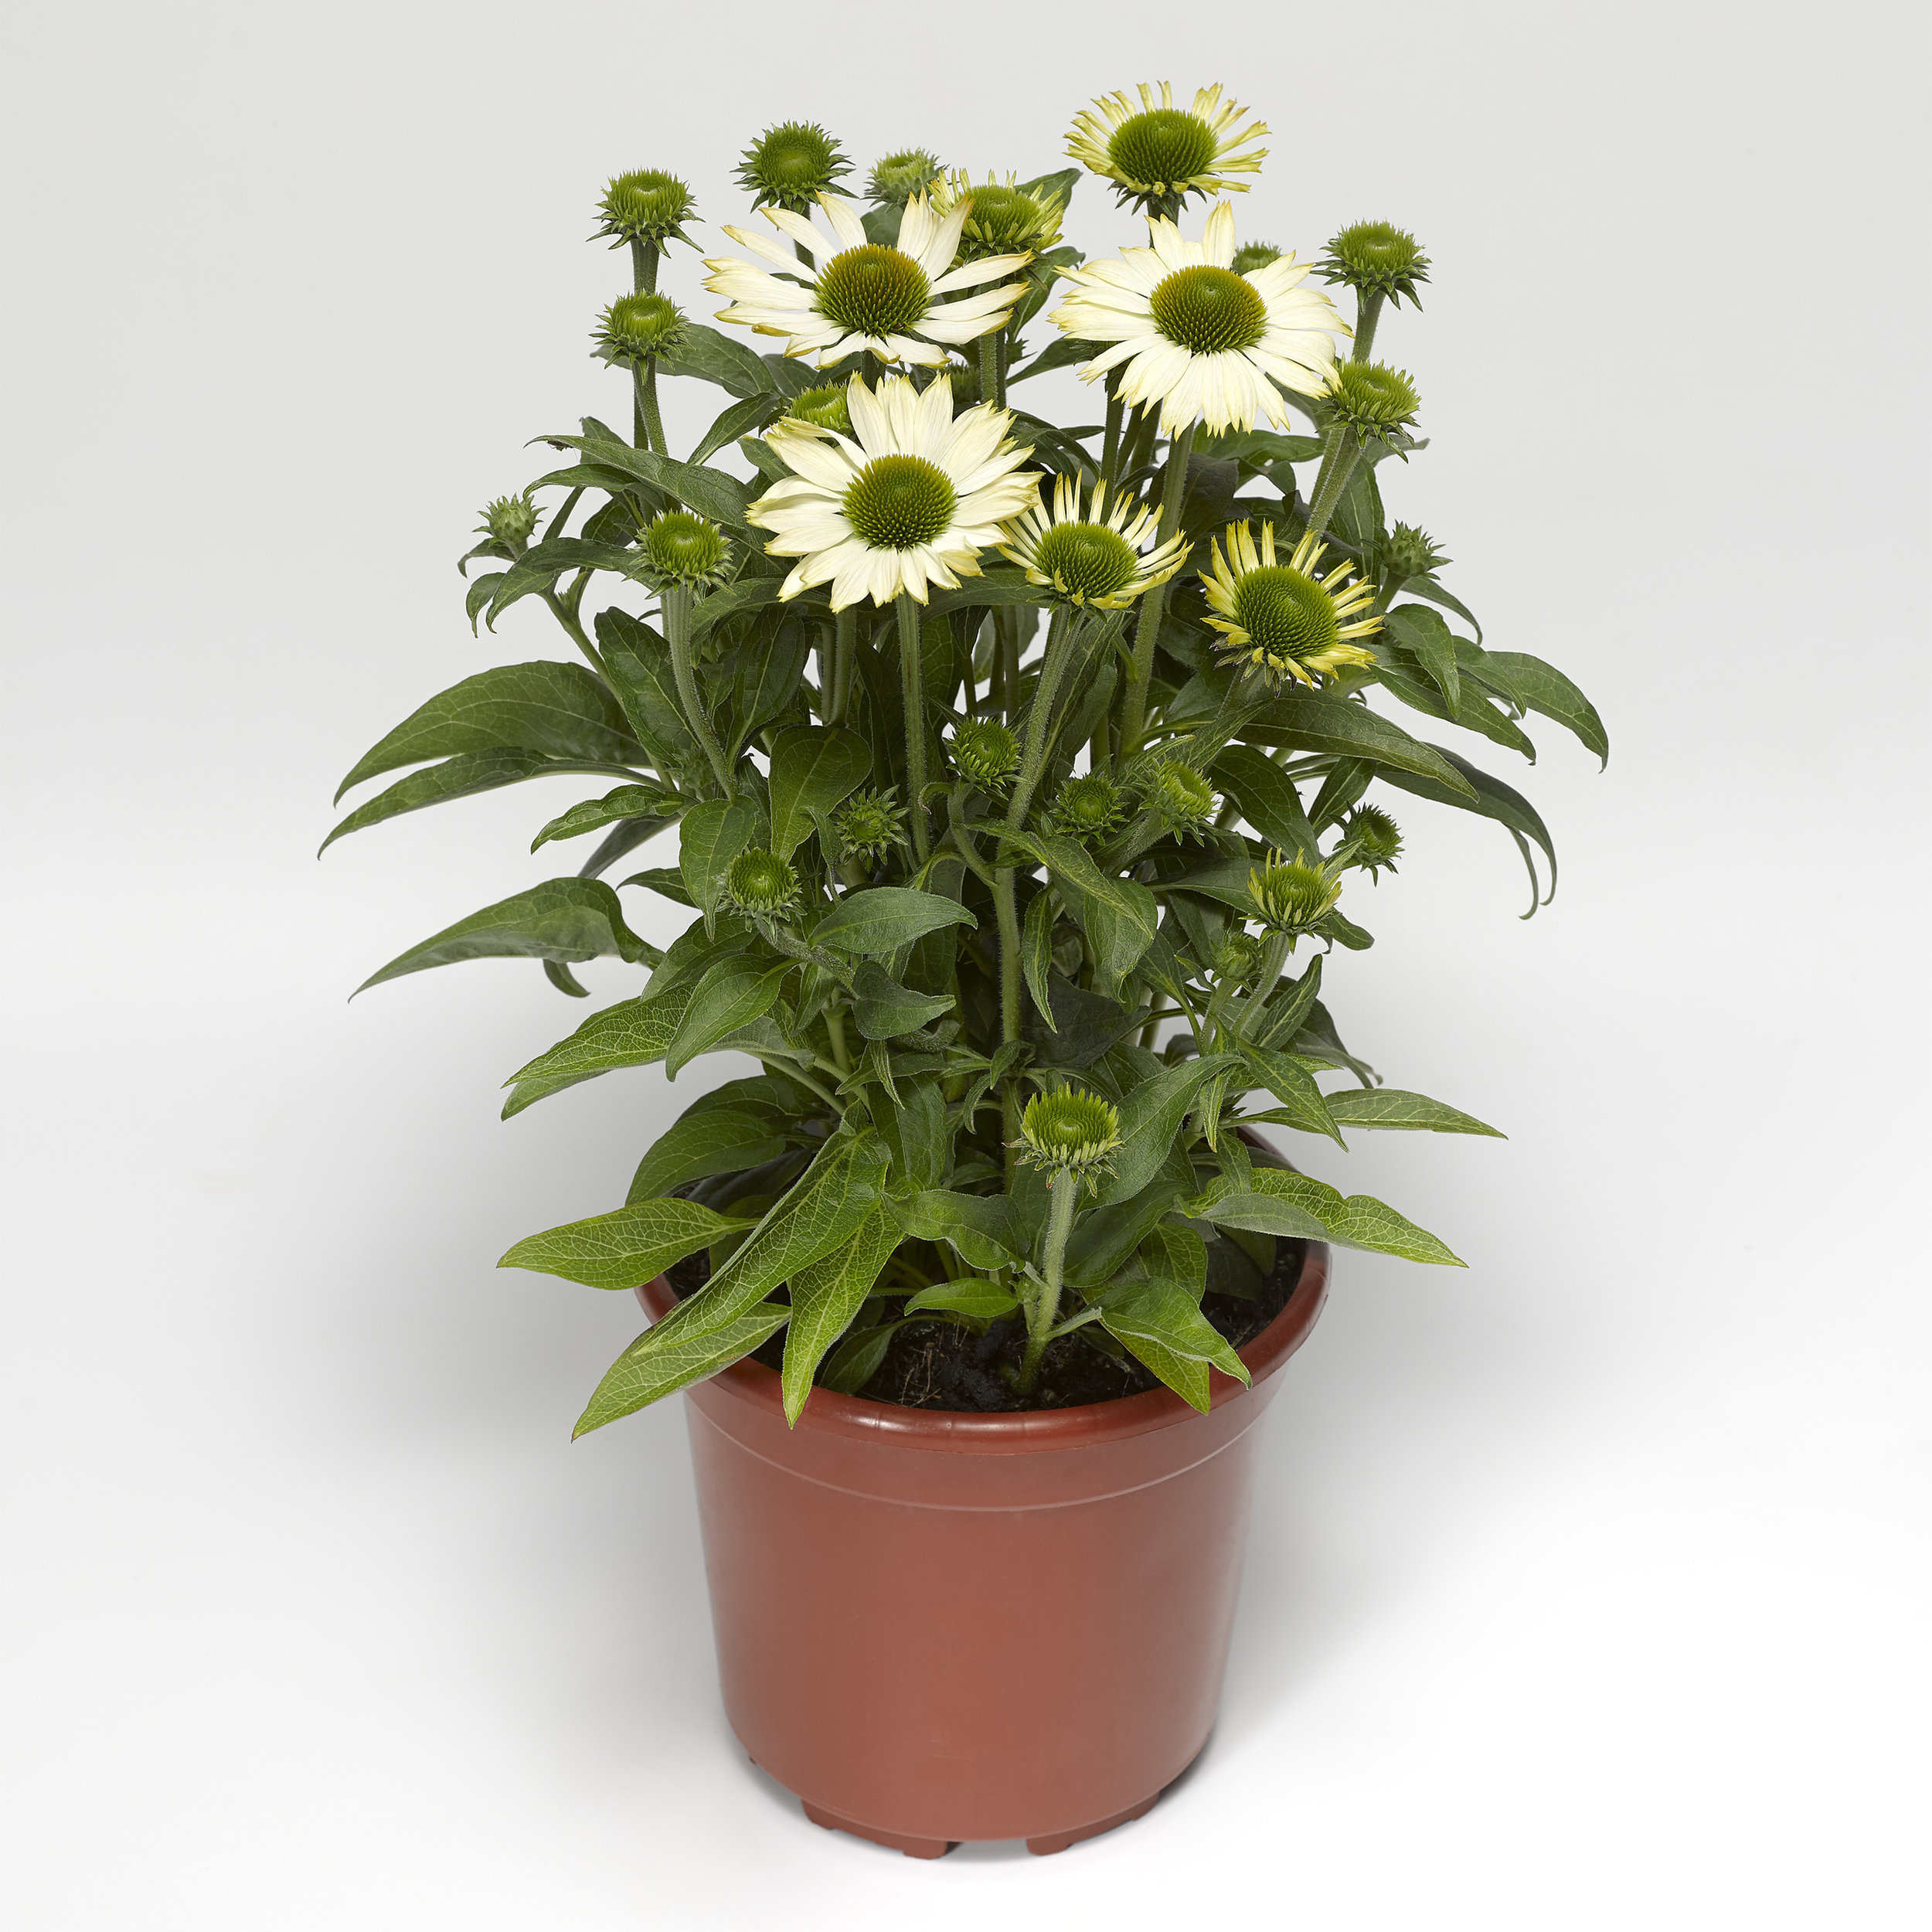 HR_Seed_Echinacea_Prairie_Splendor_Compact™_Prairie_Splendor_Compact™_White_70054424_1.jpg